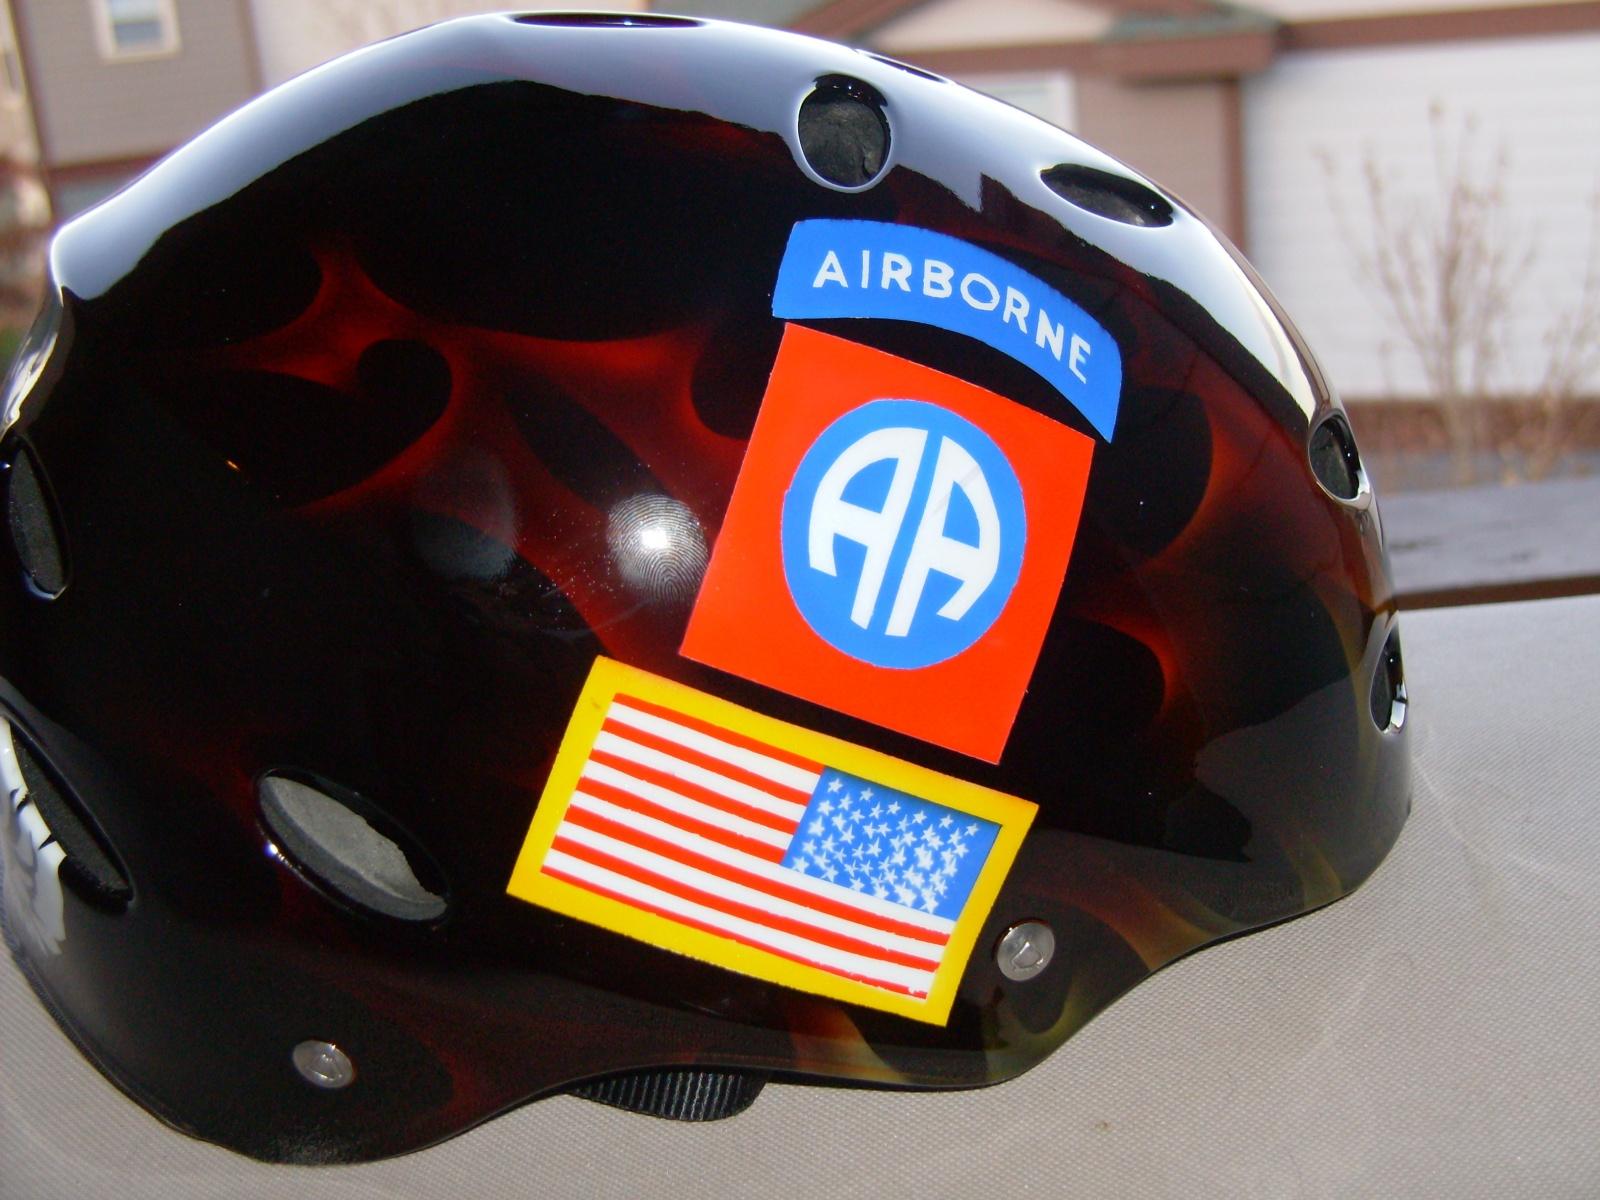 Click image for larger version  Name:Custom kayak helmet 007.jpg Views:357 Size:516.7 KB ID:845